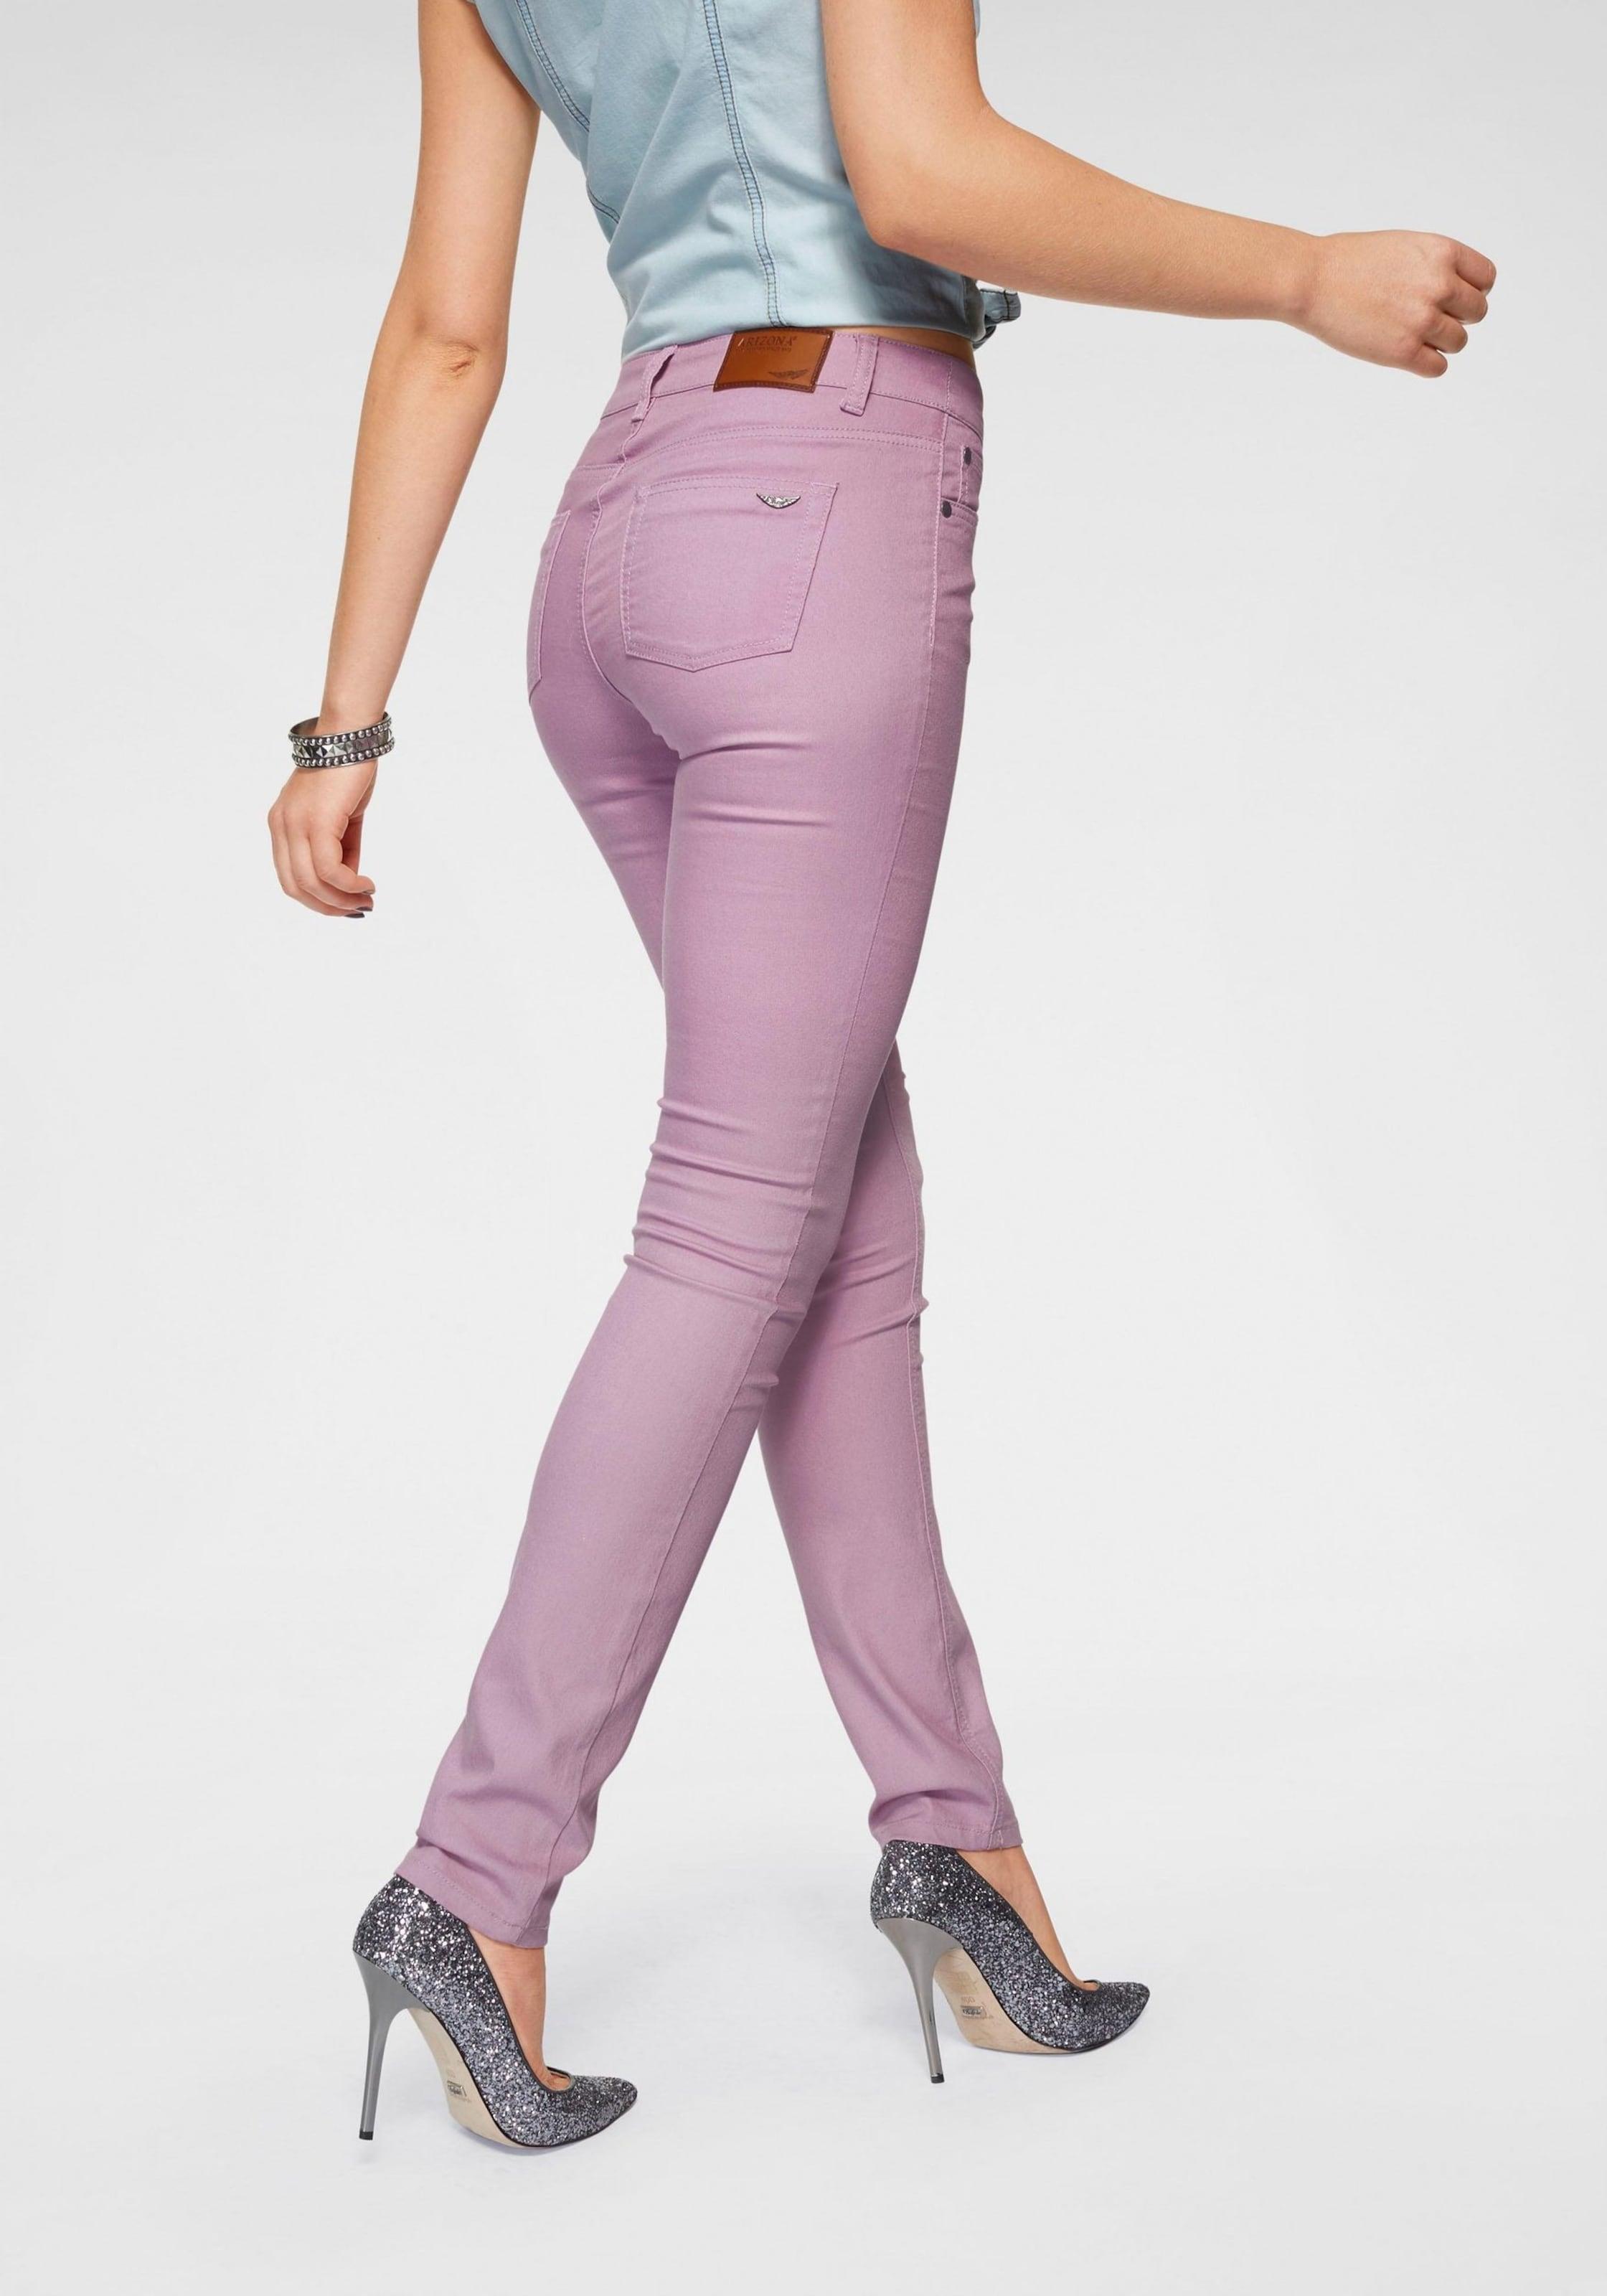 Arizona Arizona Jeans Jeans Flieder In In Flieder dxhrCQts